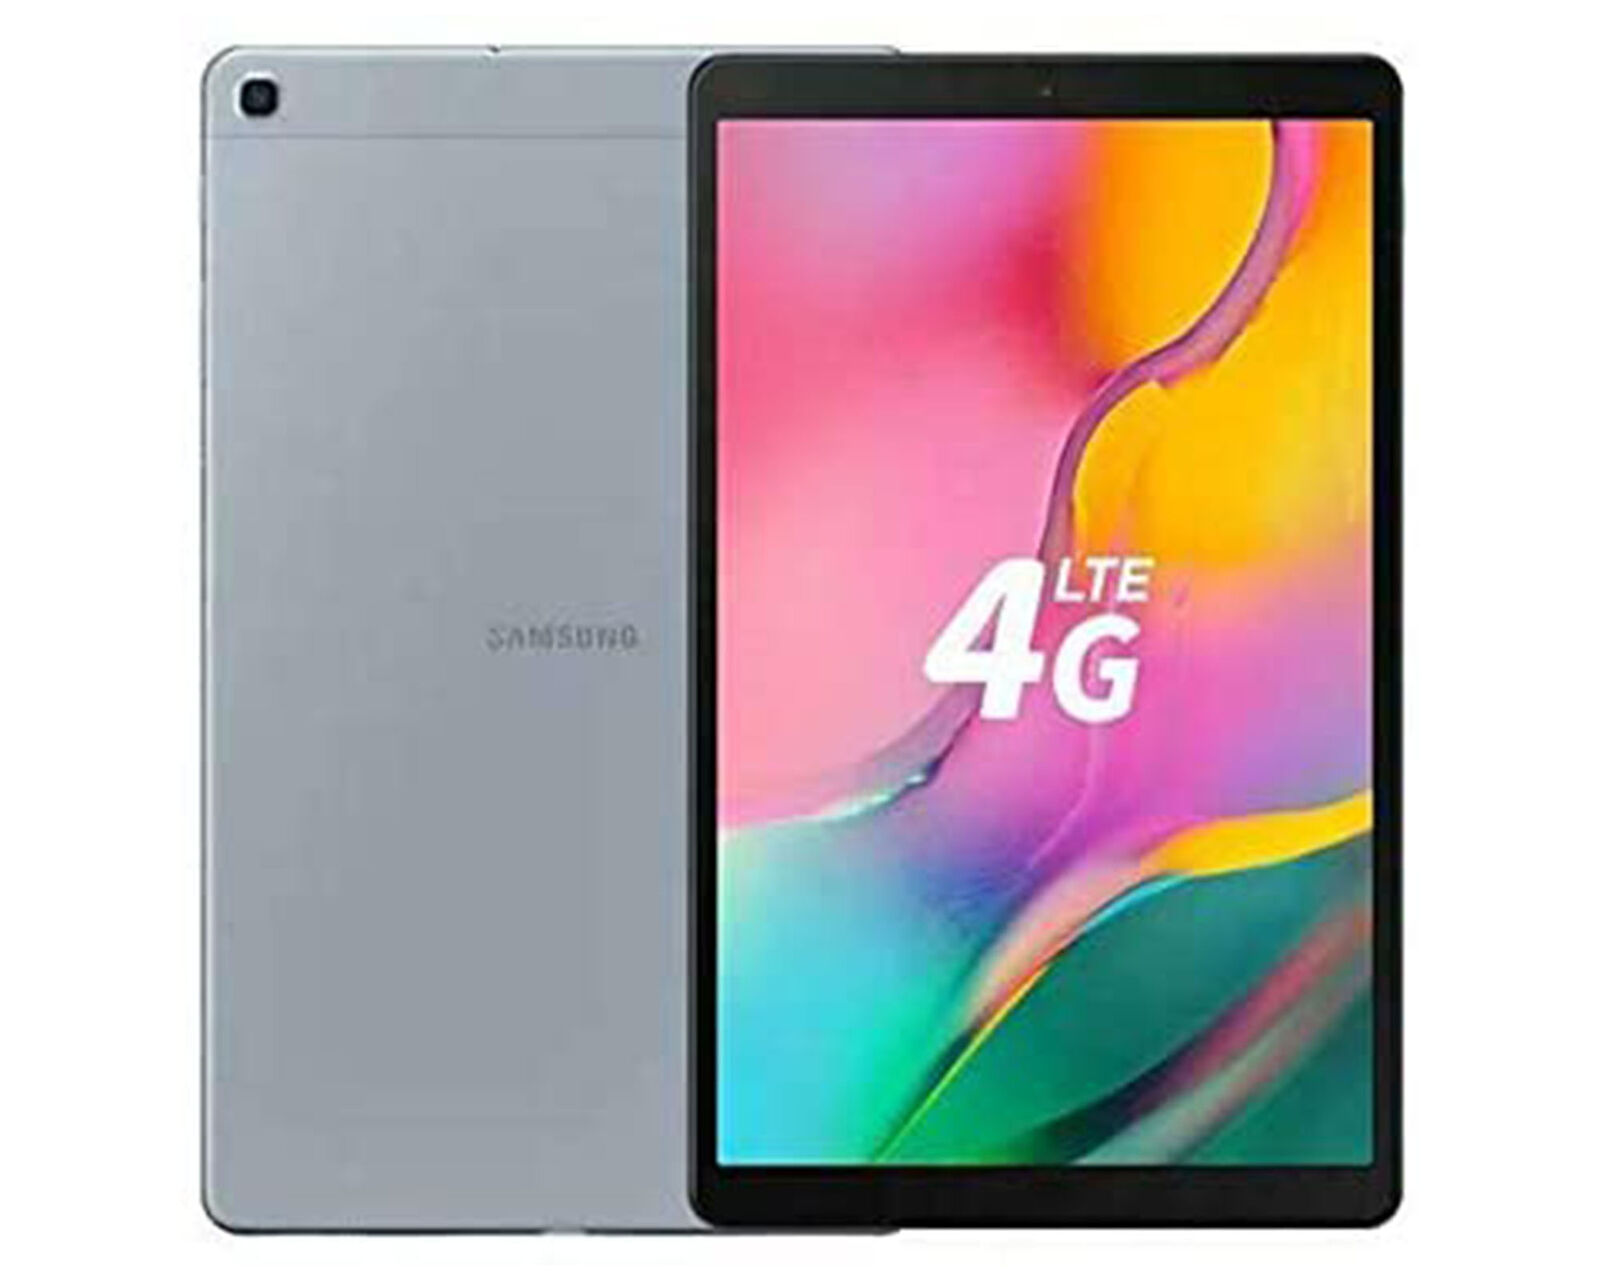 "Samsung Galaxy Tab A 10.1"" (SM-T517P) - (Refurbished)"